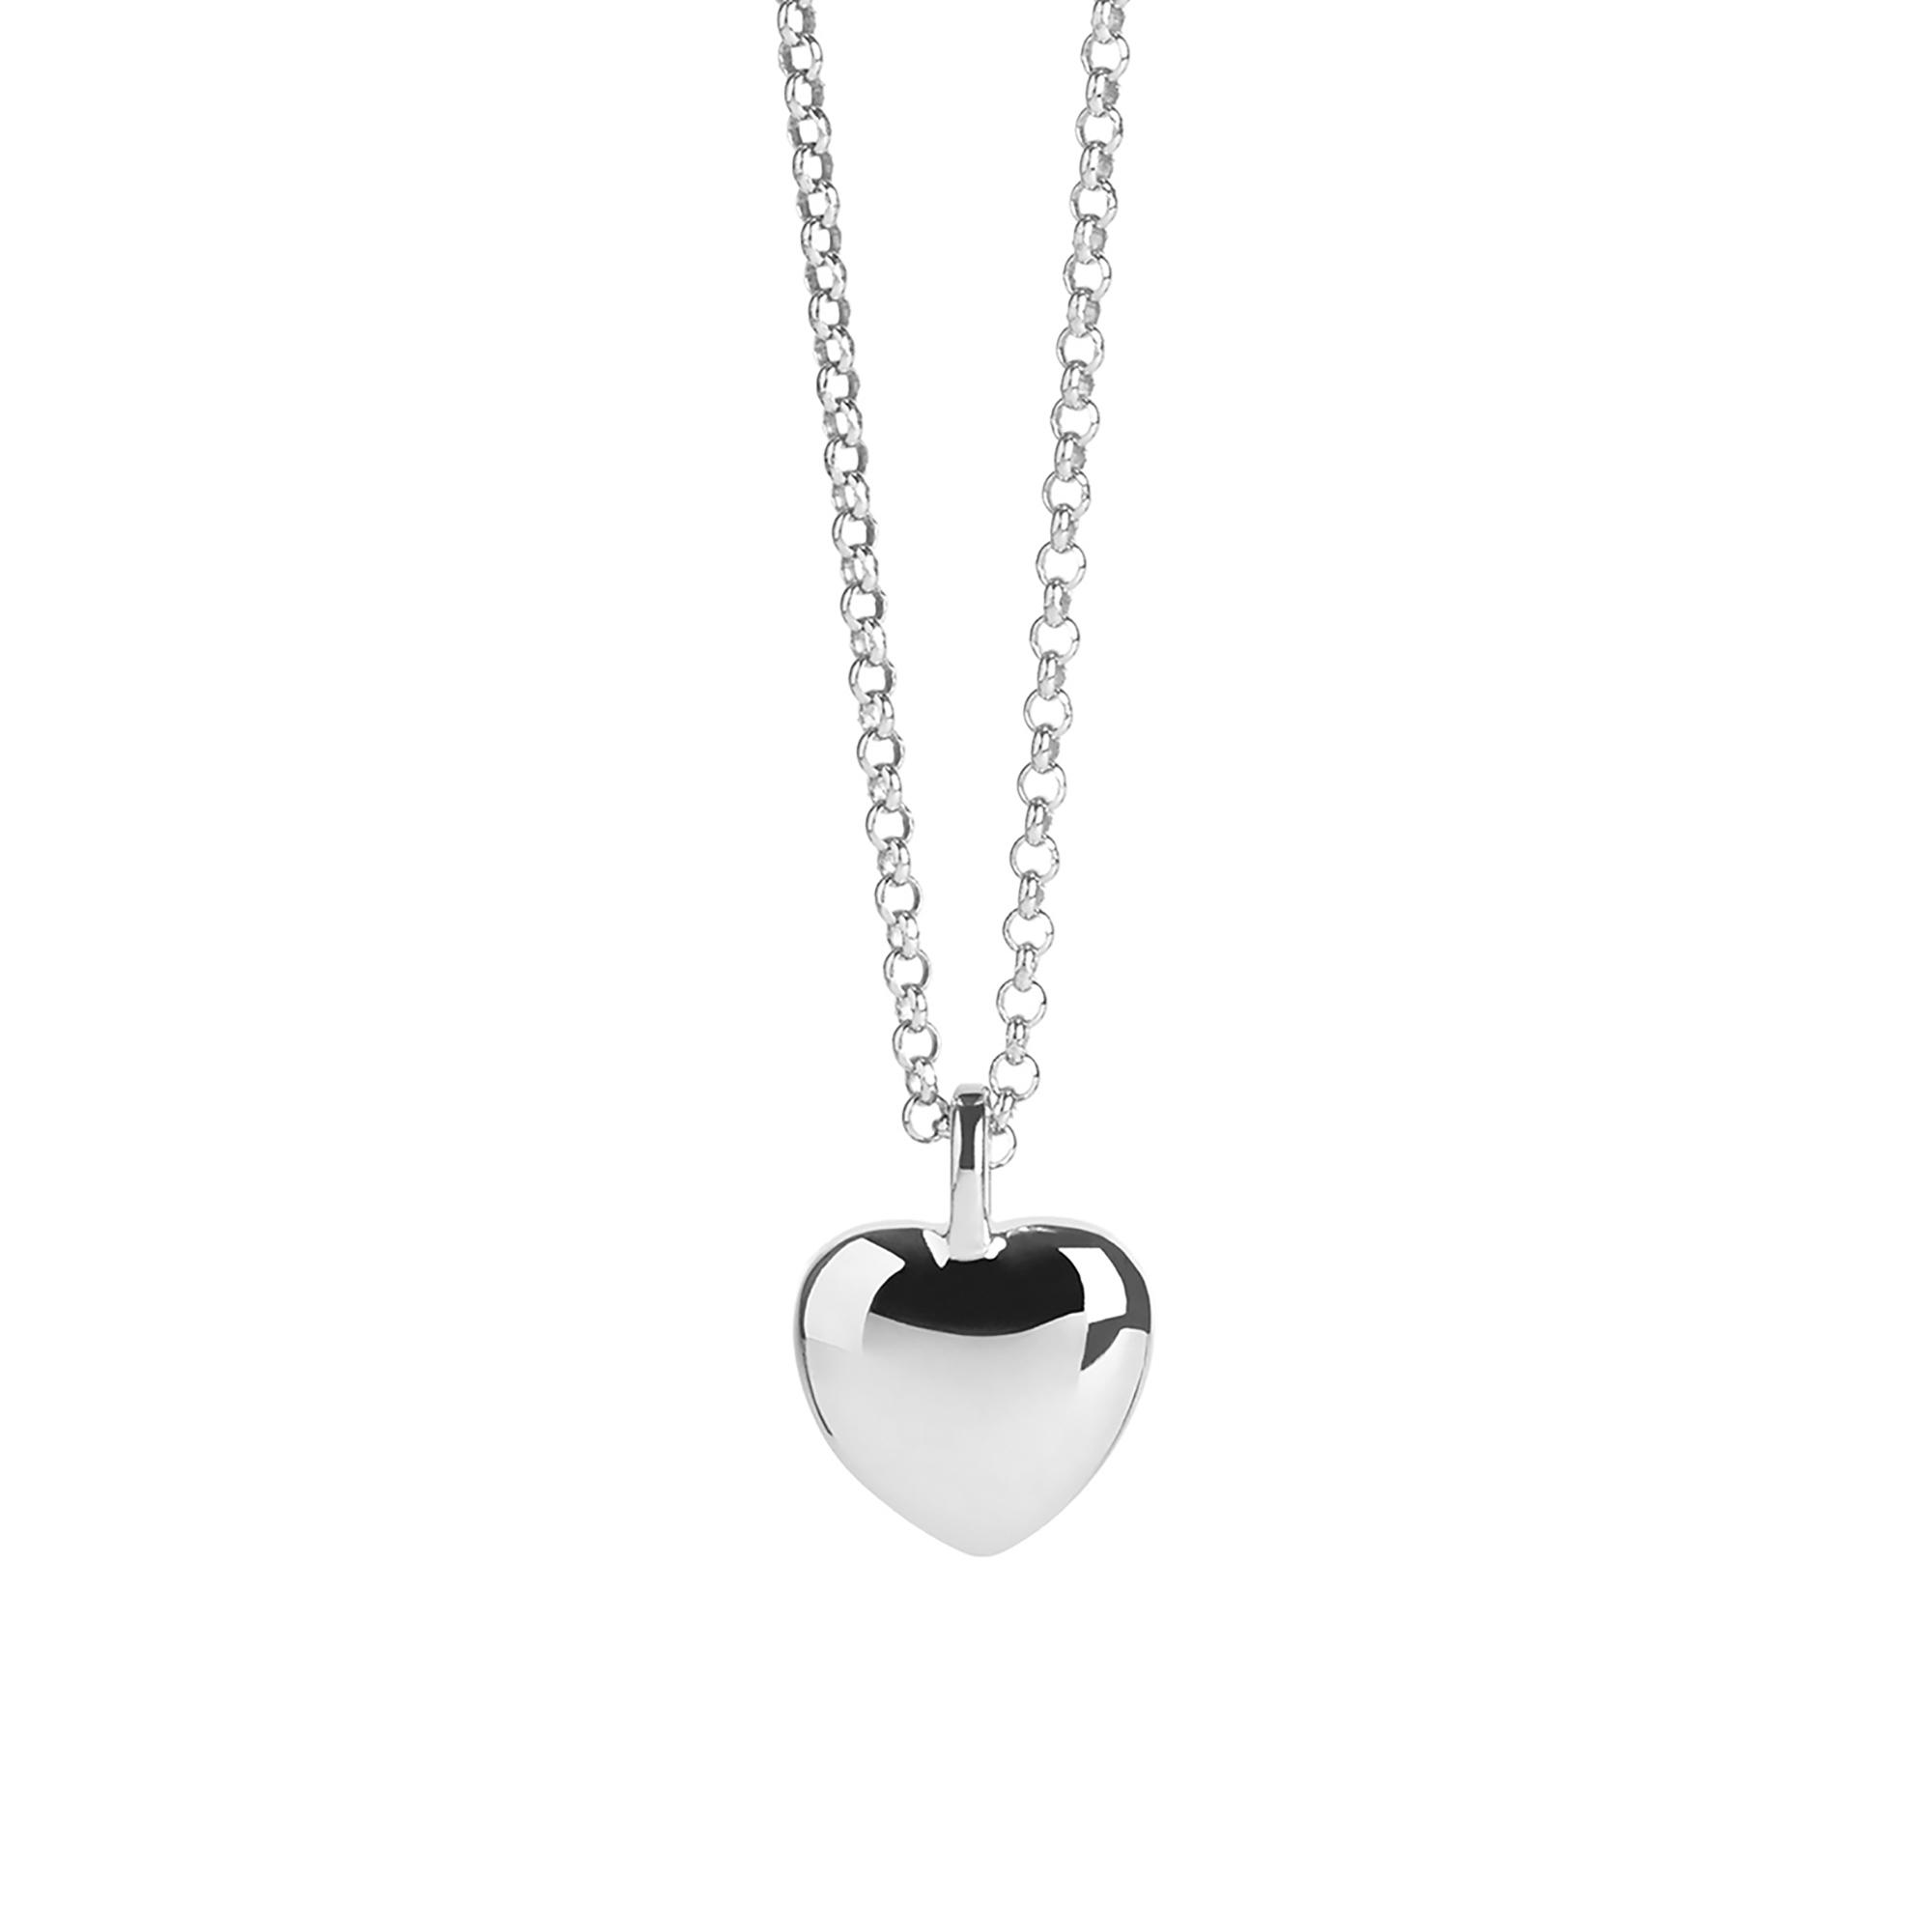 Muru Heart Pebble Necklace Sterling Silver